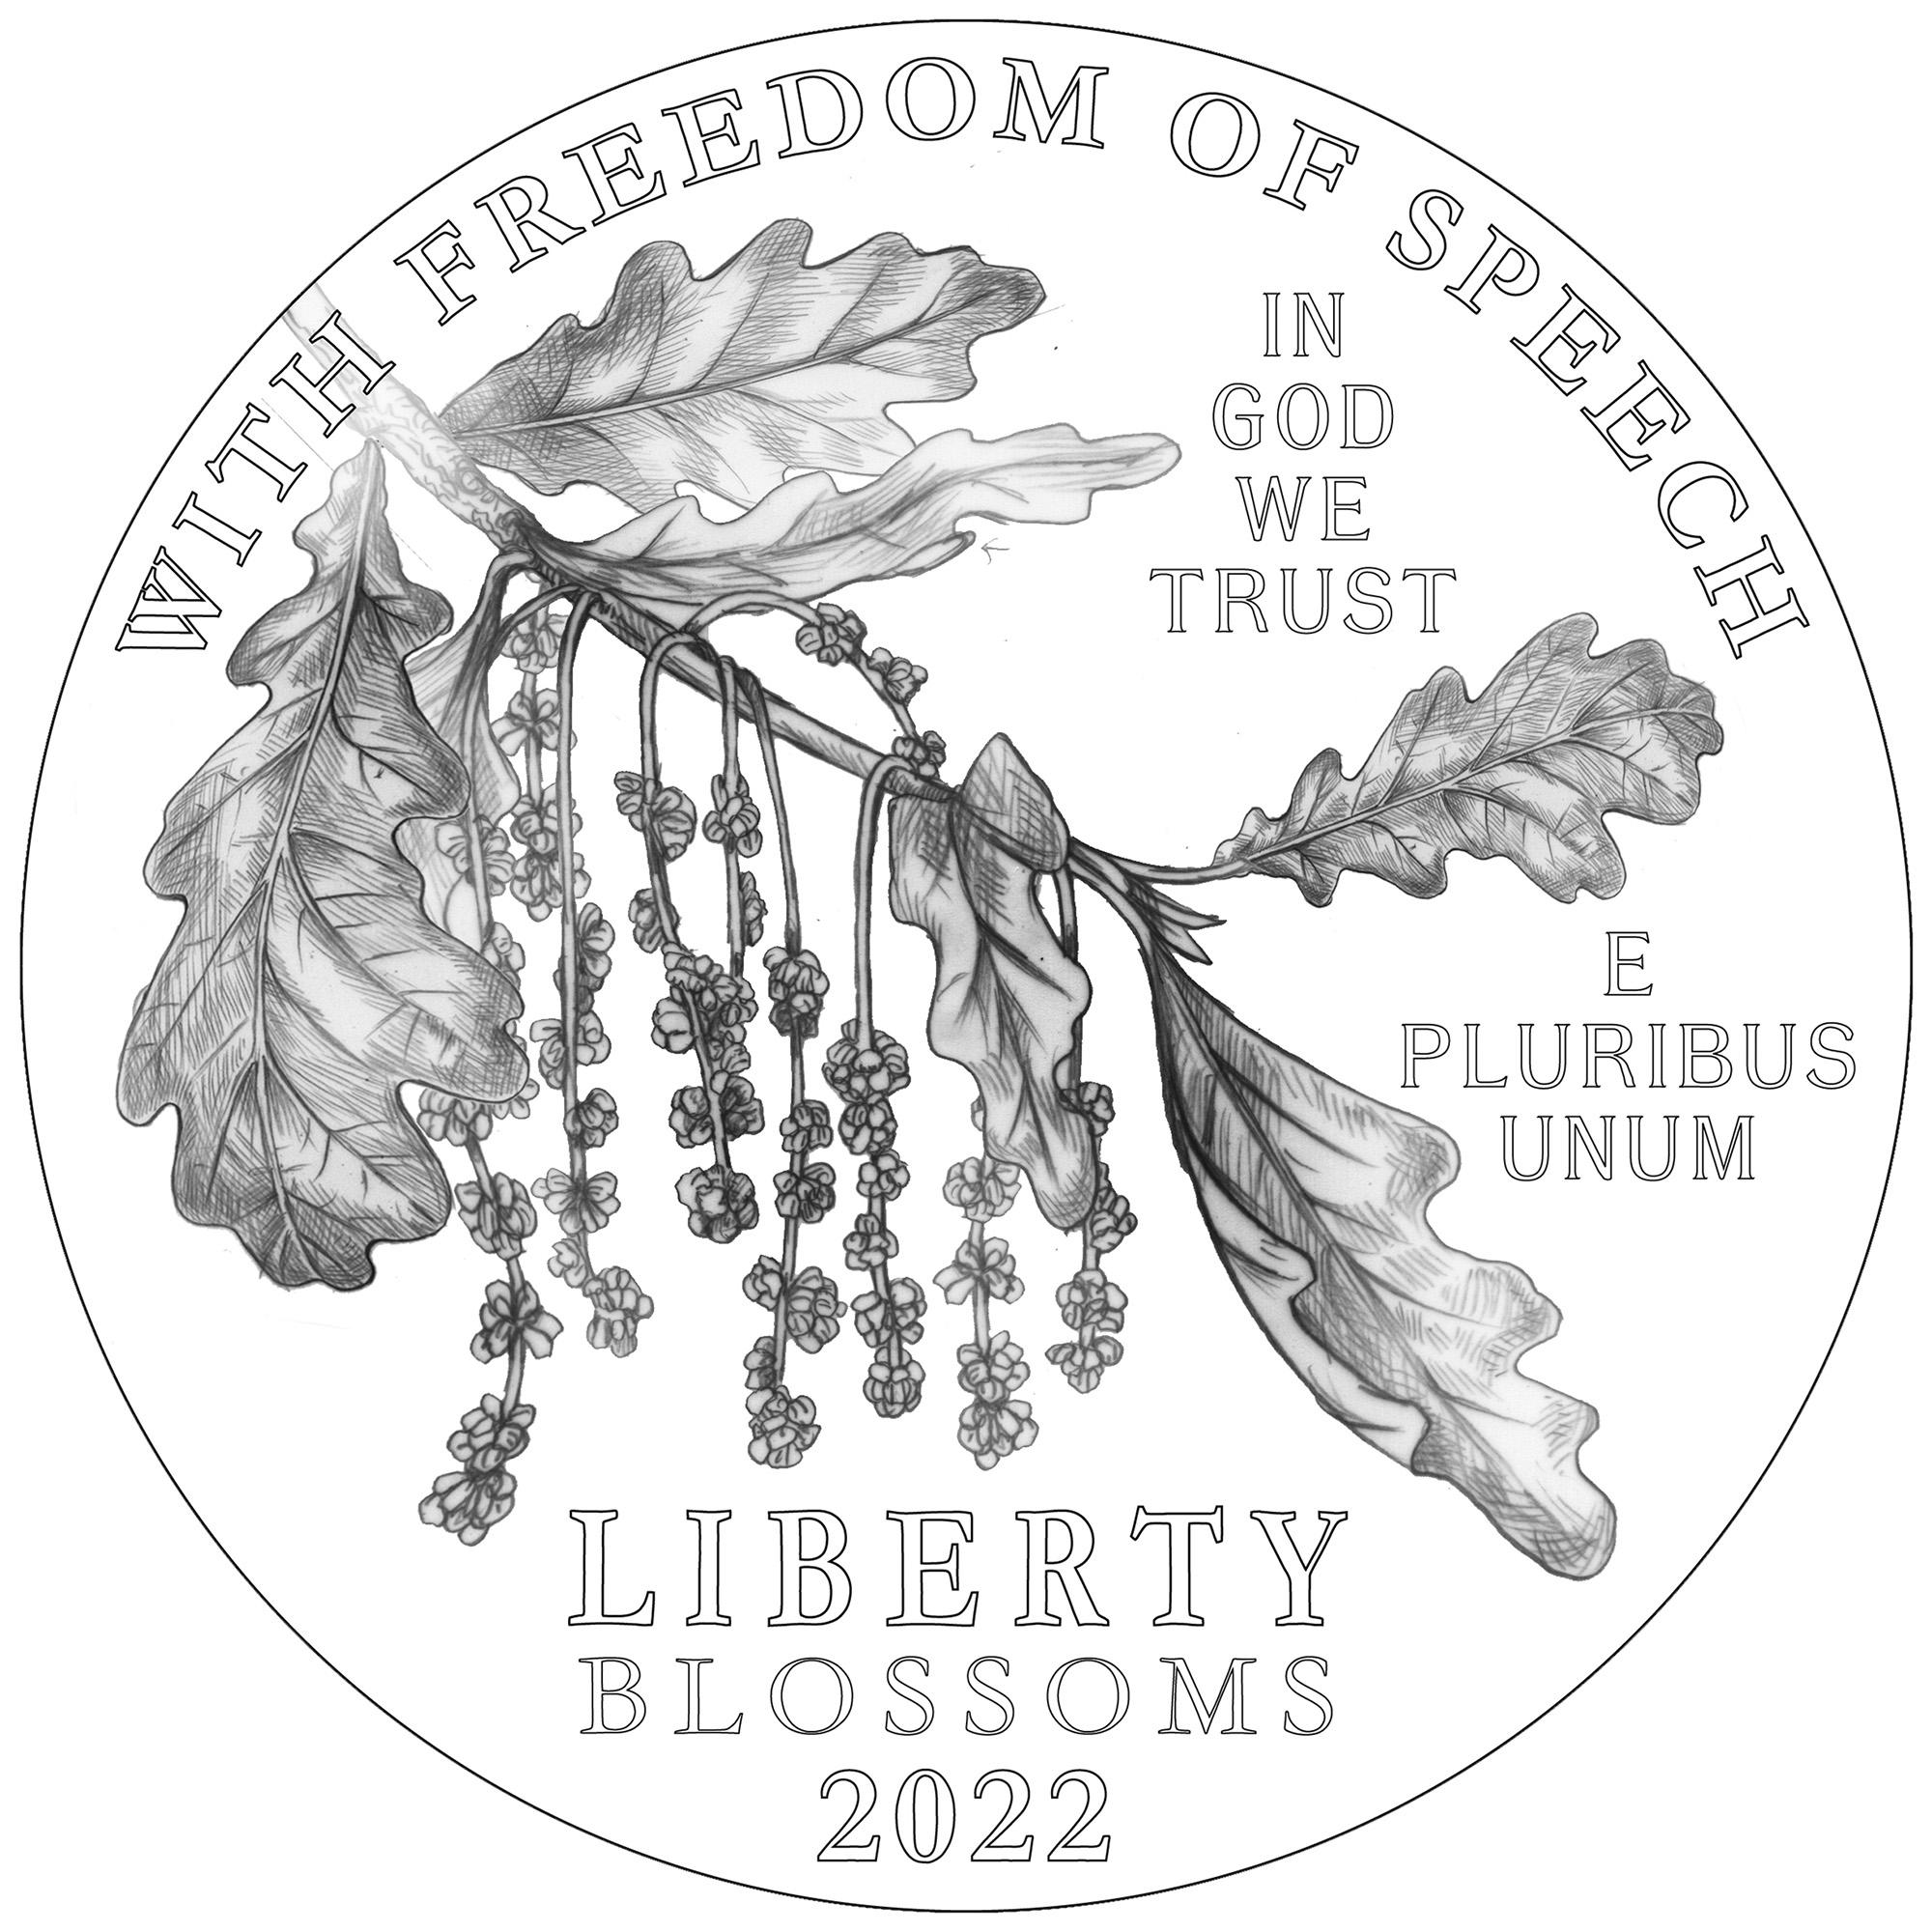 2022 American Eagle Platinum Proof Coin Line Art Obverse